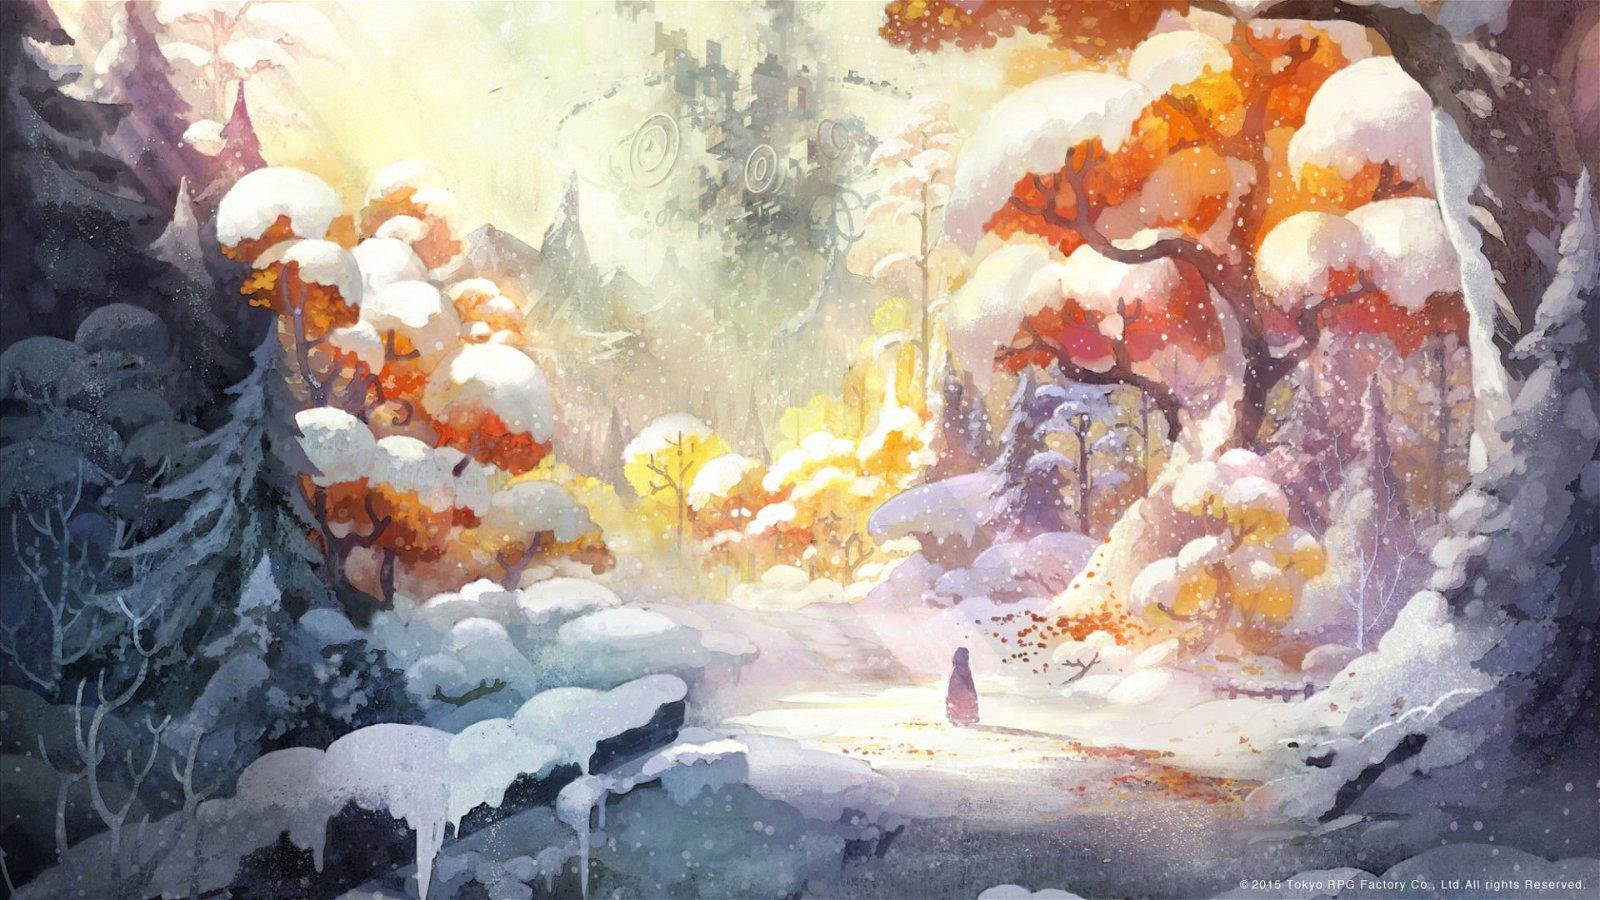 I am Setsuna Preview - The Return of the Classic Square RPG 8